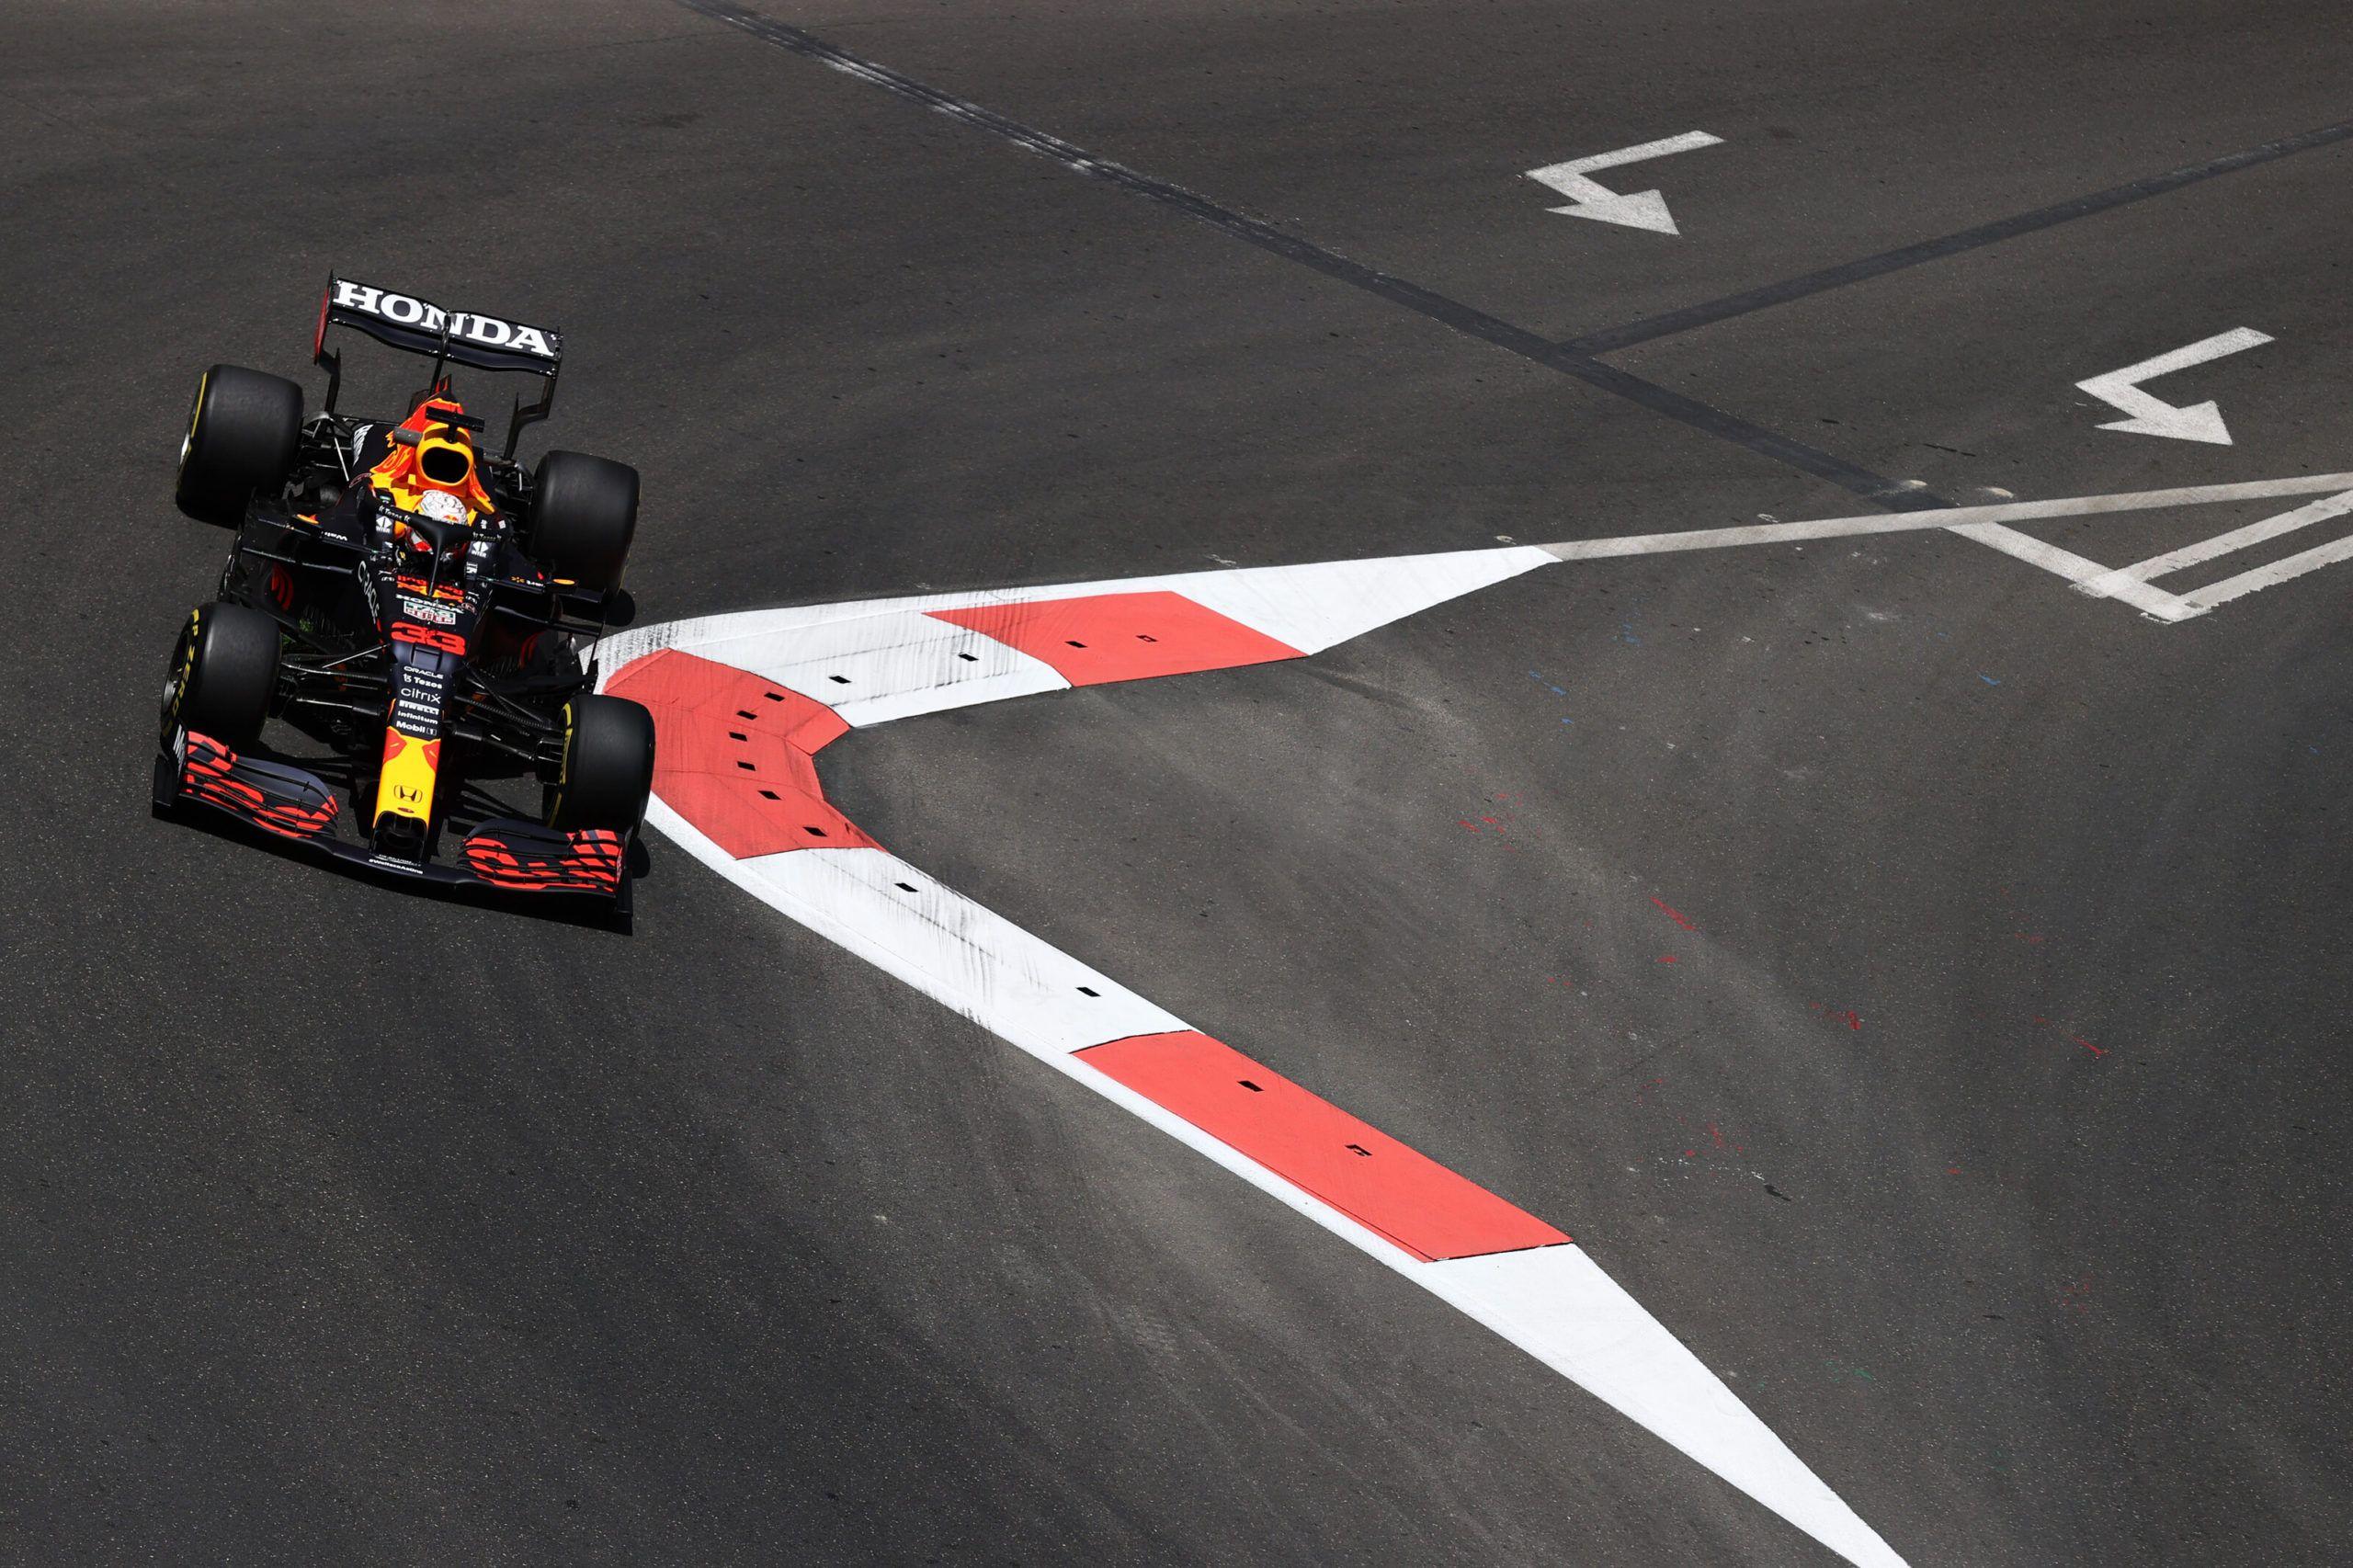 F1, Azerbaijan GP, Max Verstappen